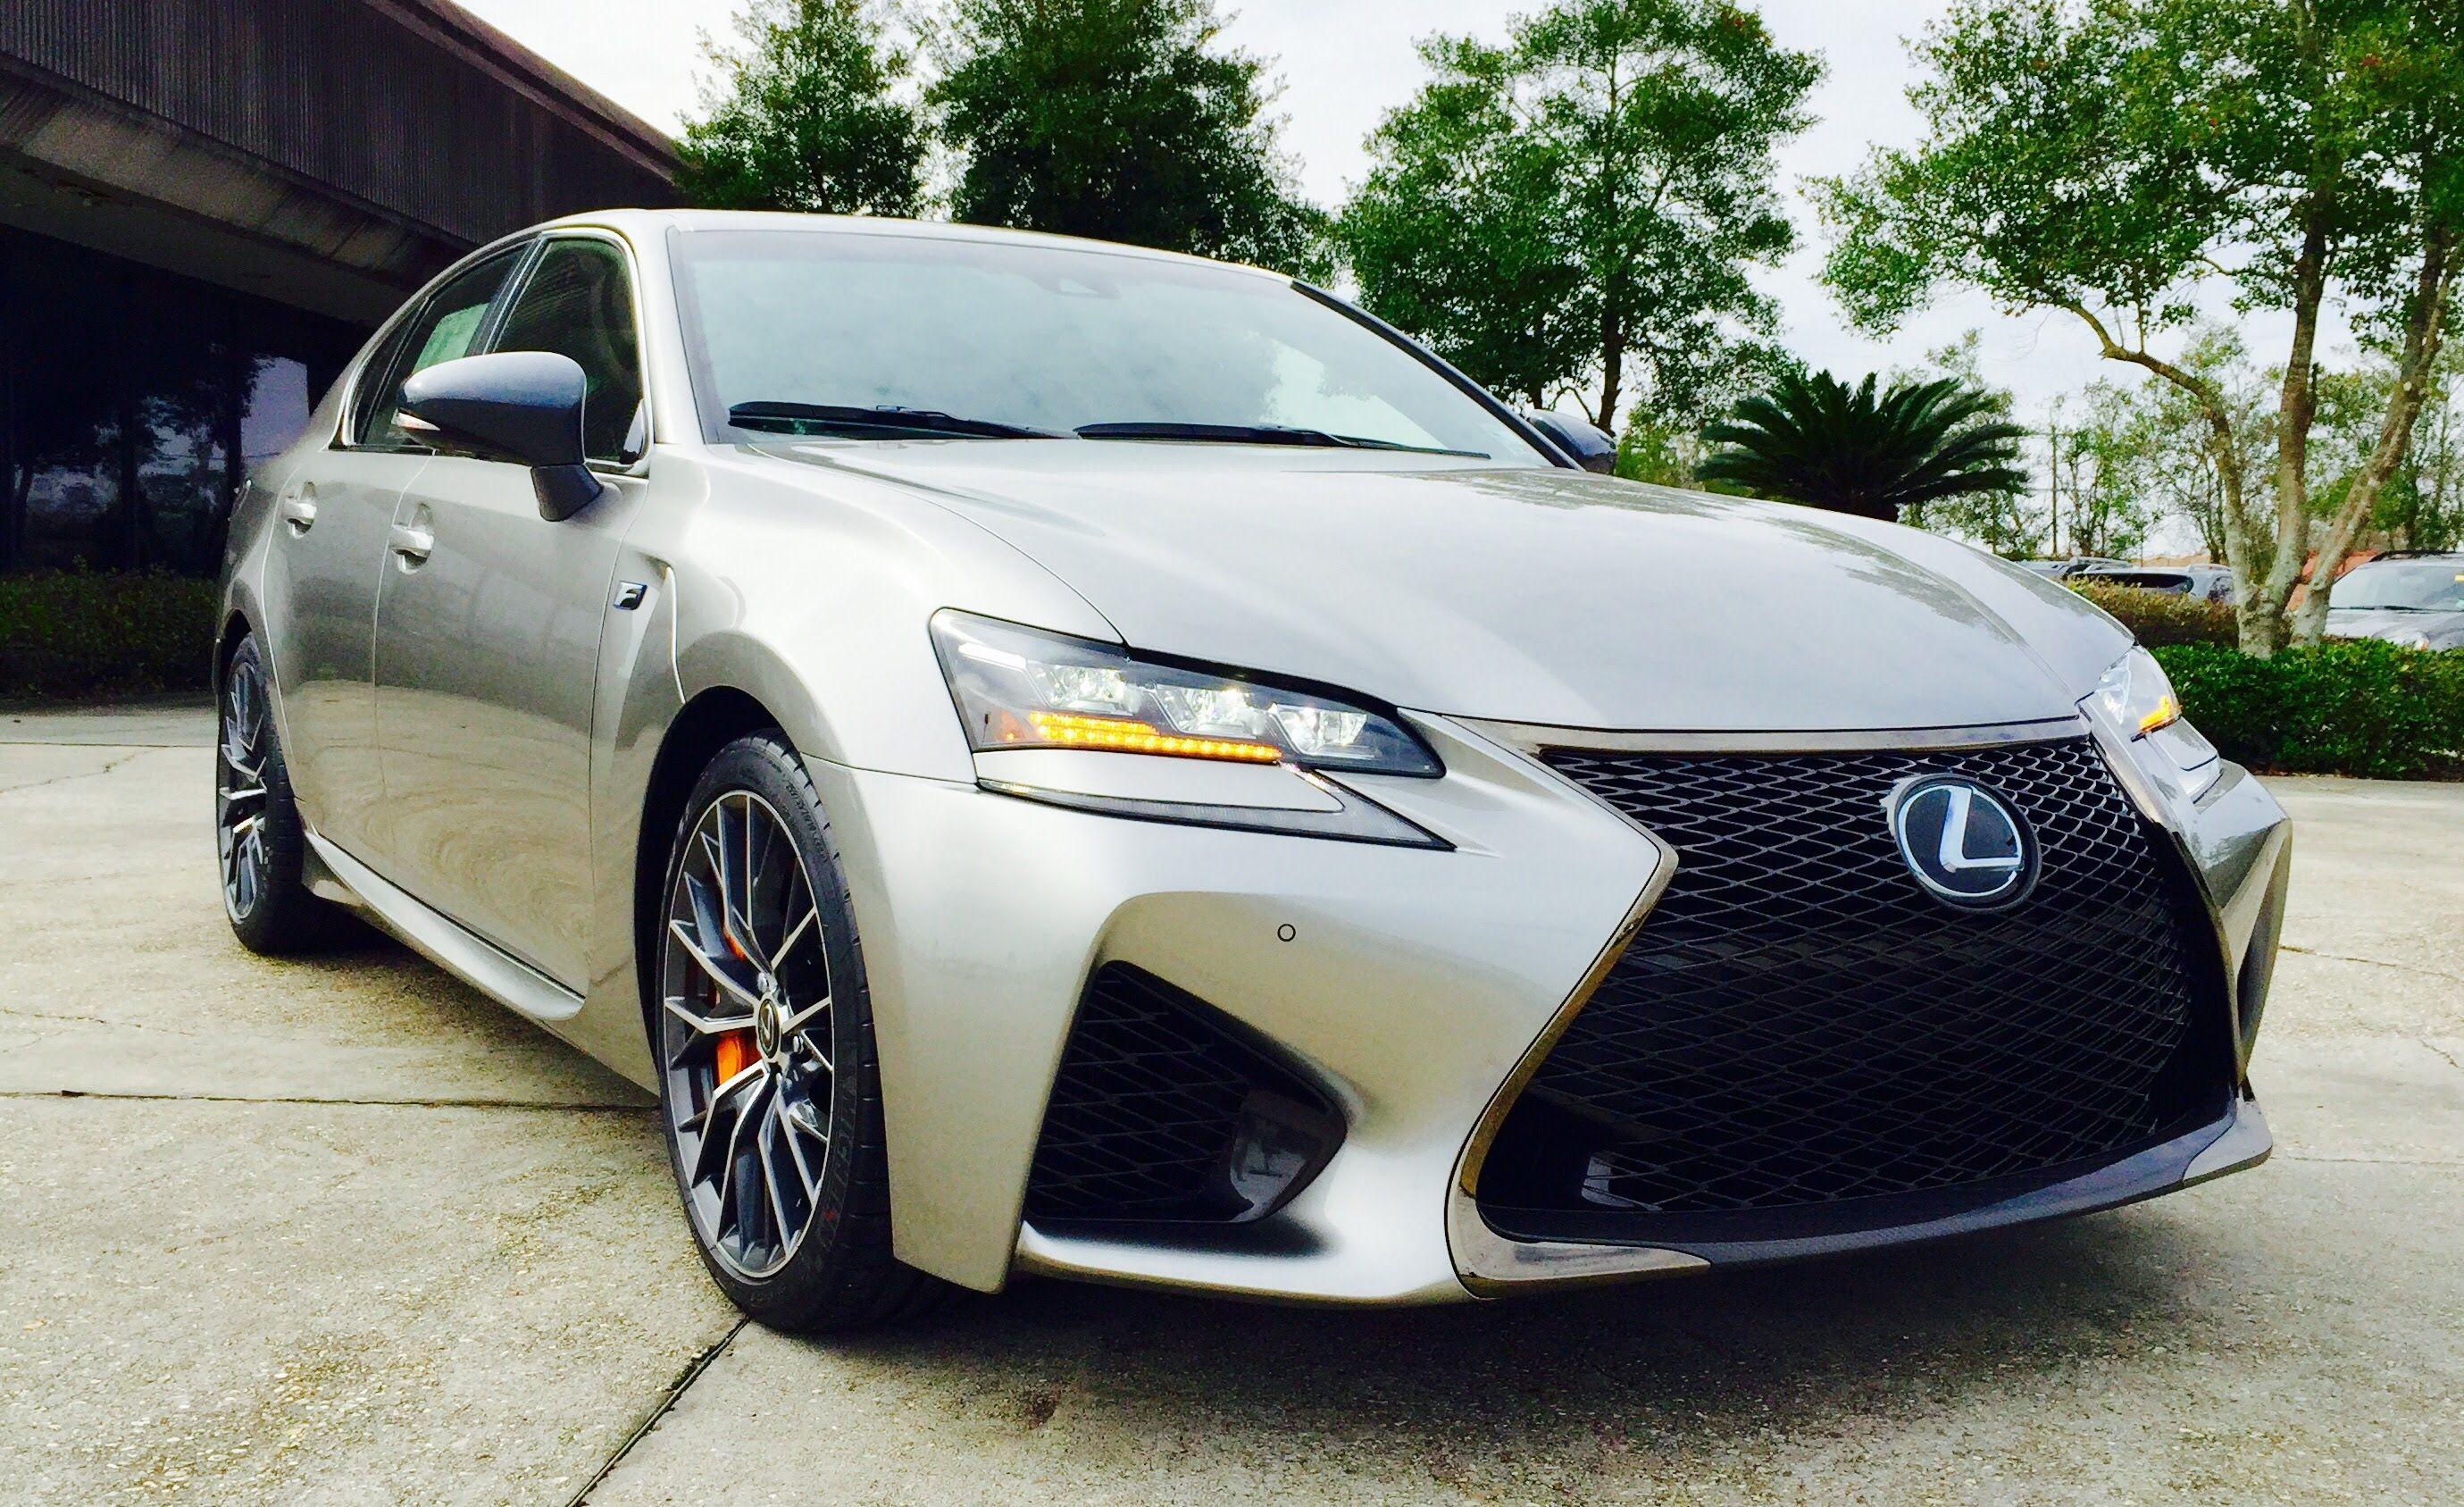 2016 Lexus Gs F Gs 350 Full Review Start Up Exhaust Short Drive Lexus Start Up Black Leather